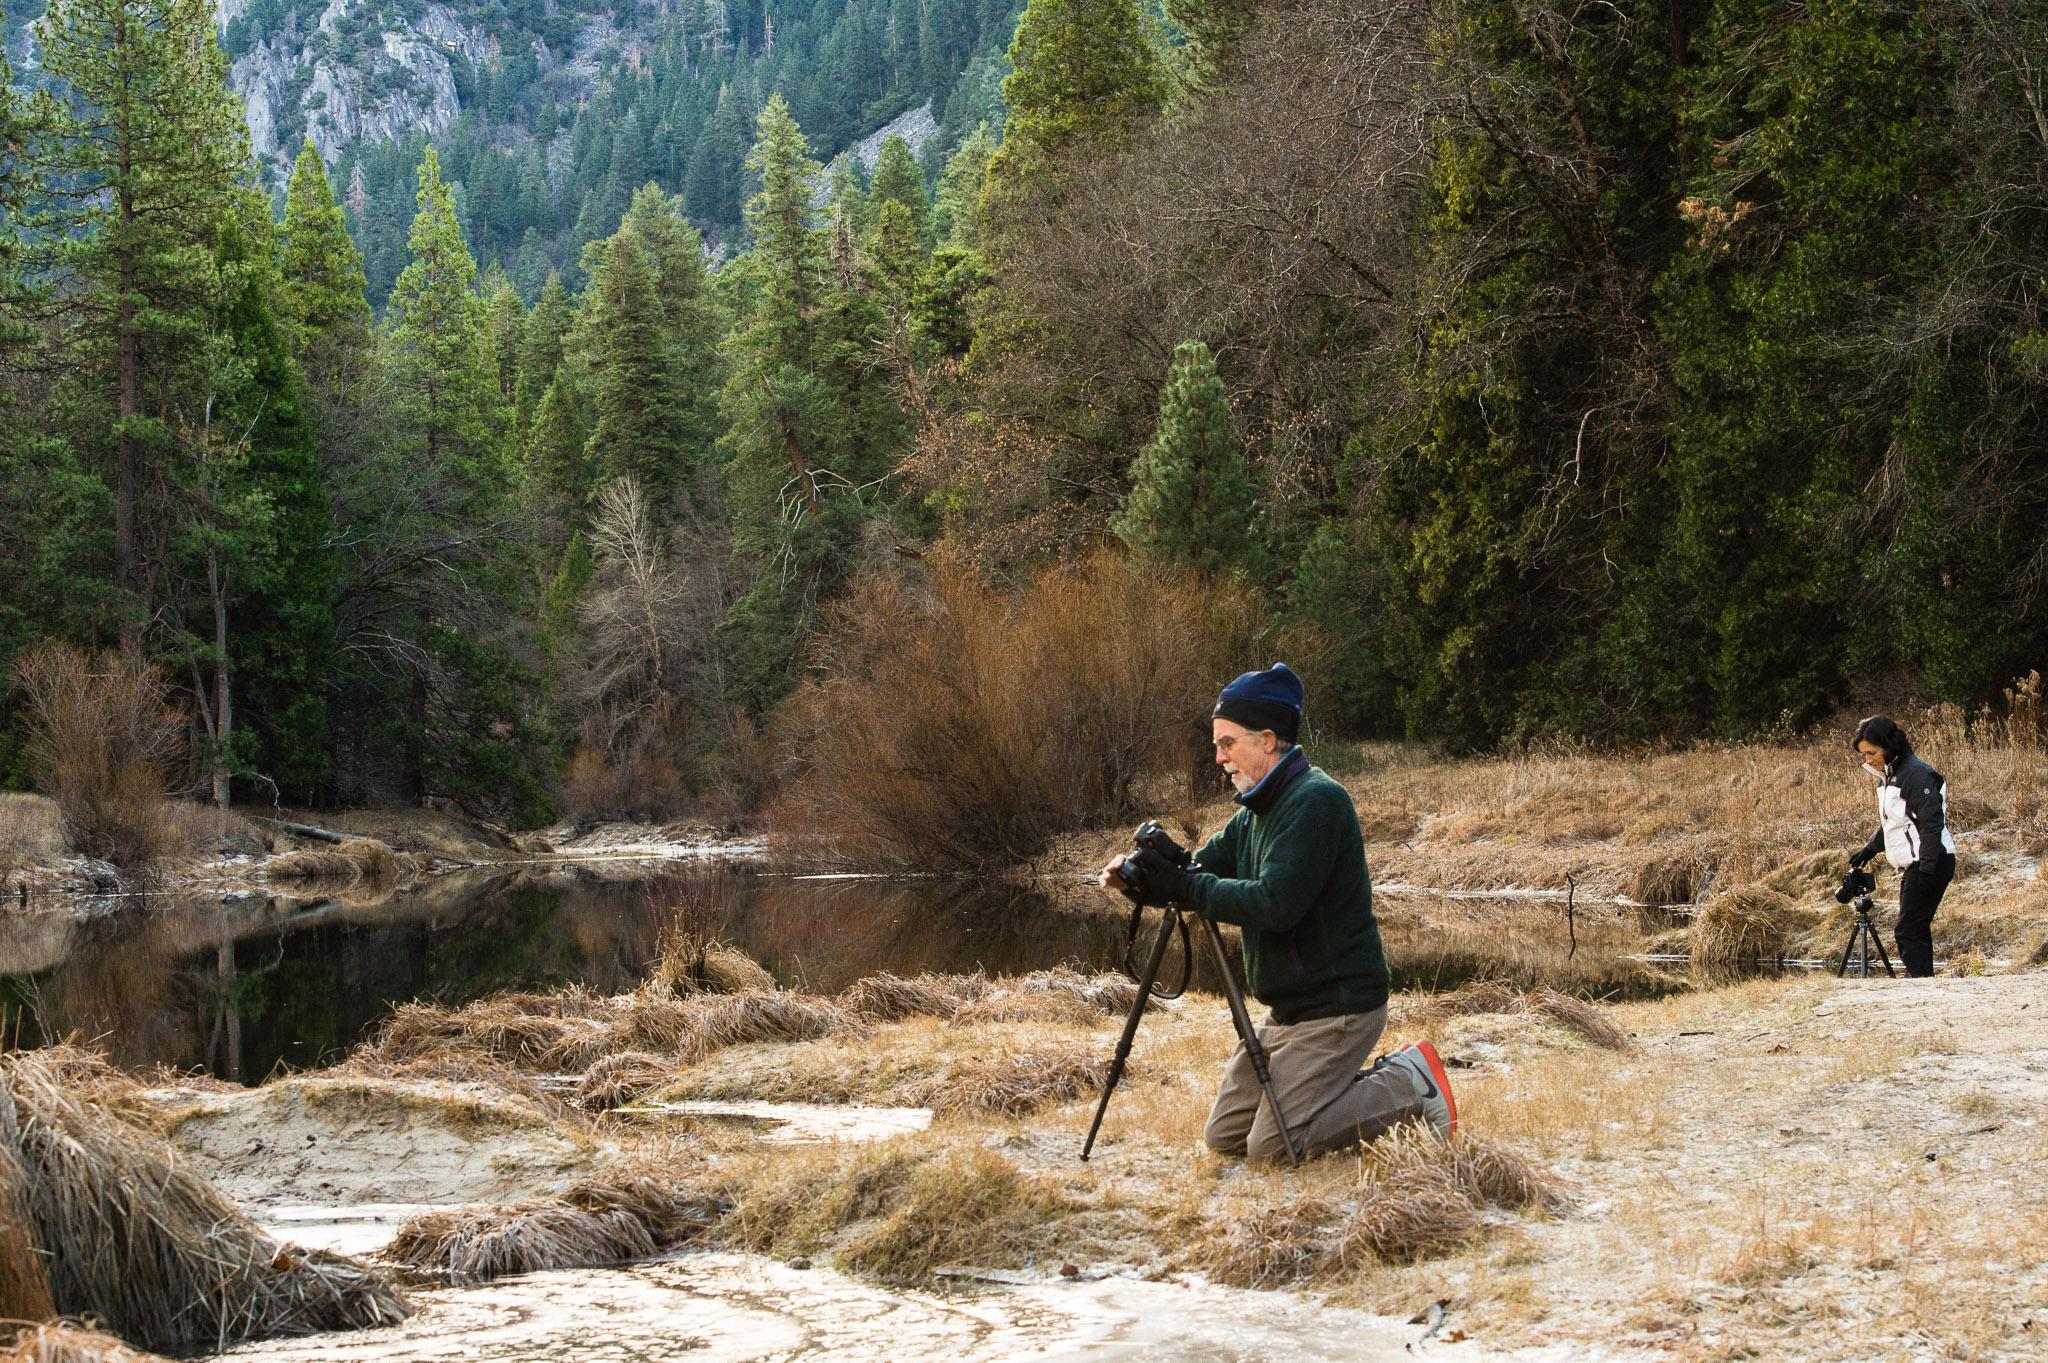 Jason-Davis-Images-Yosemite-0018.jpg